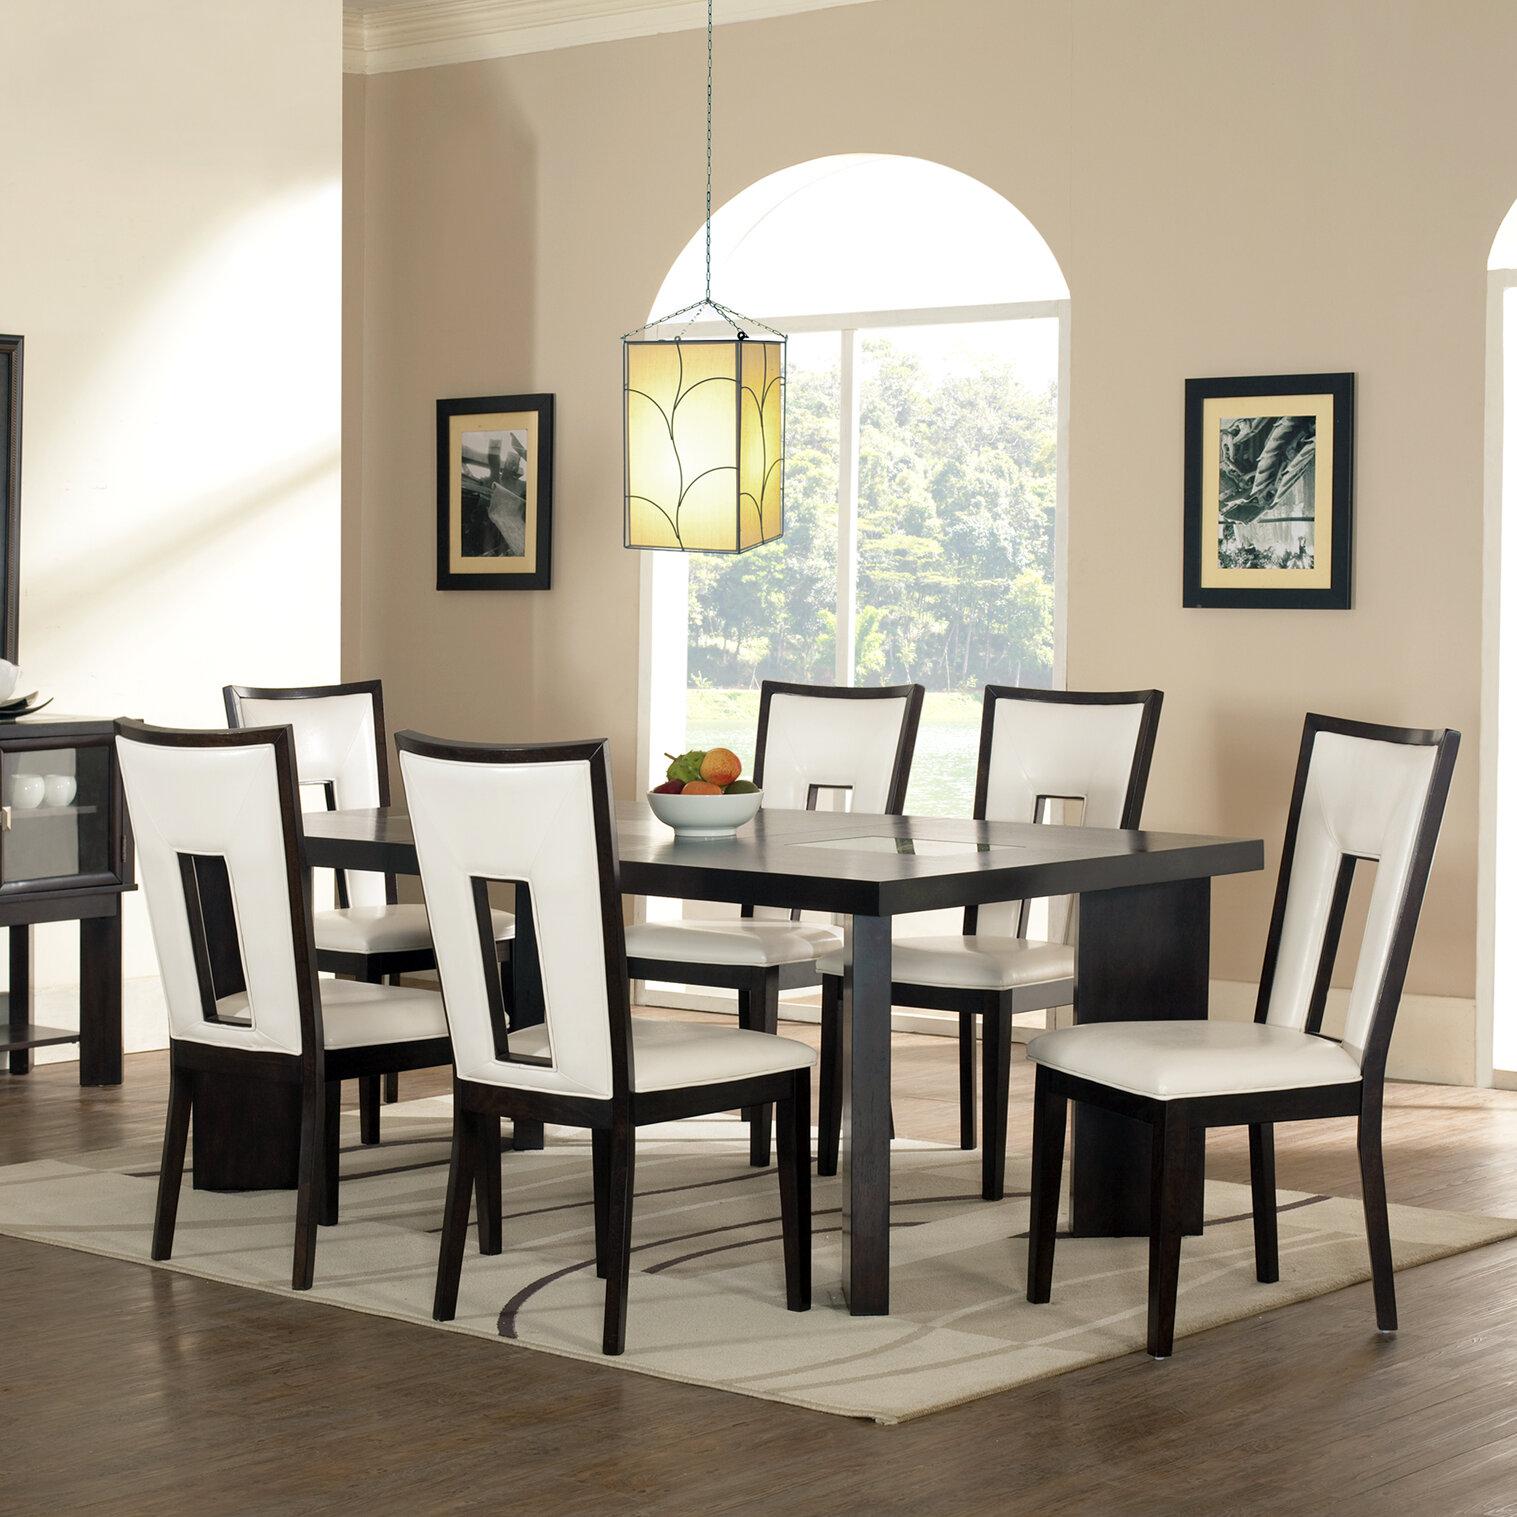 Brayden Studio Hillcrest 7 Piece Counter Height Dining Set U0026 Reviews    Wayfair